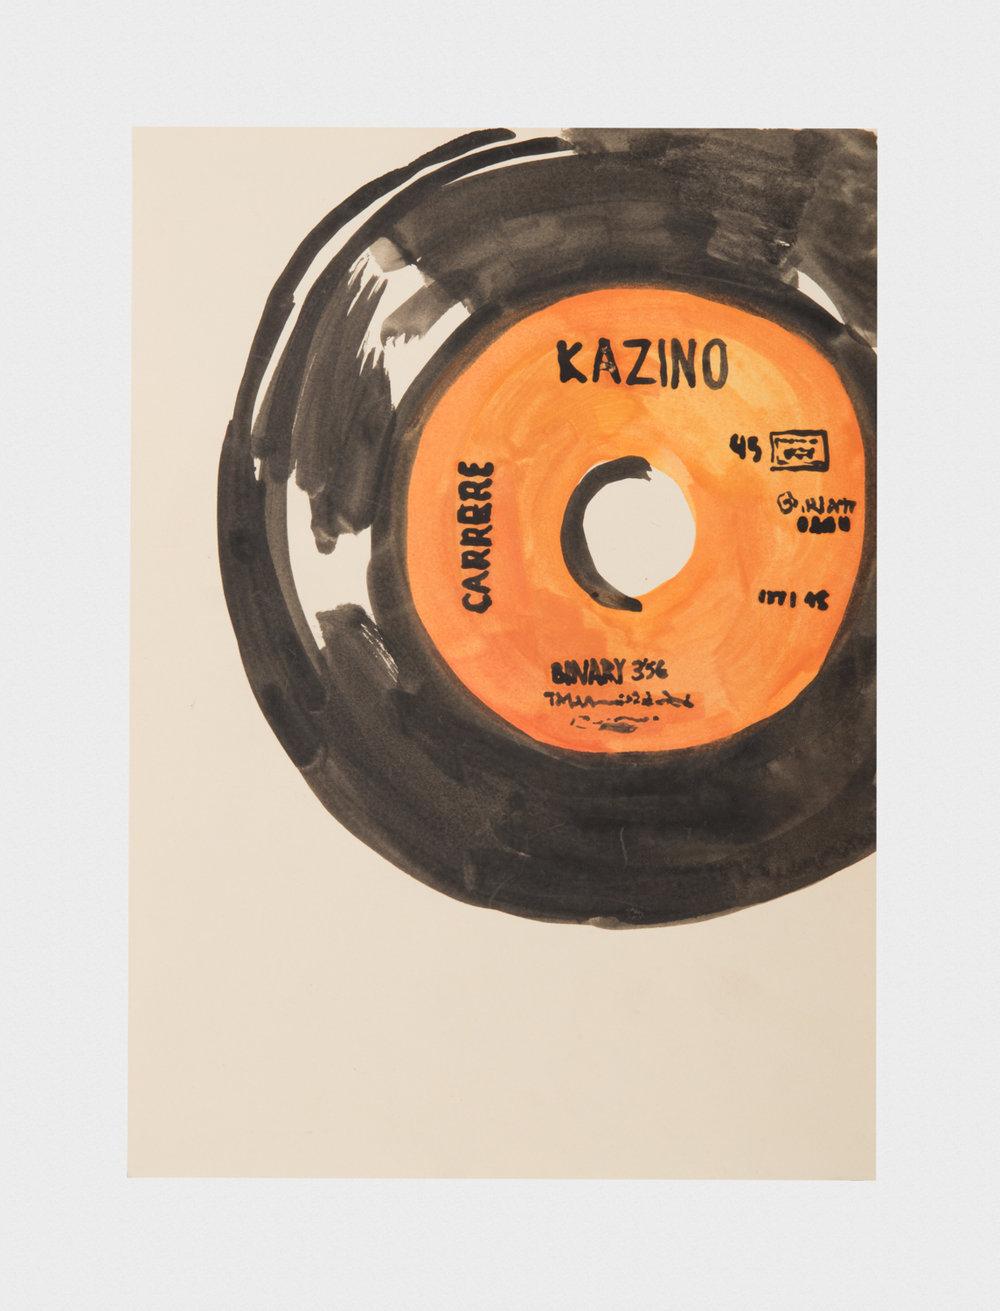 Alex Becerra Kazino 2016 Watercolor 11 3/4 x 8 1/3 in (29.85h x 21.16w cm) AB329